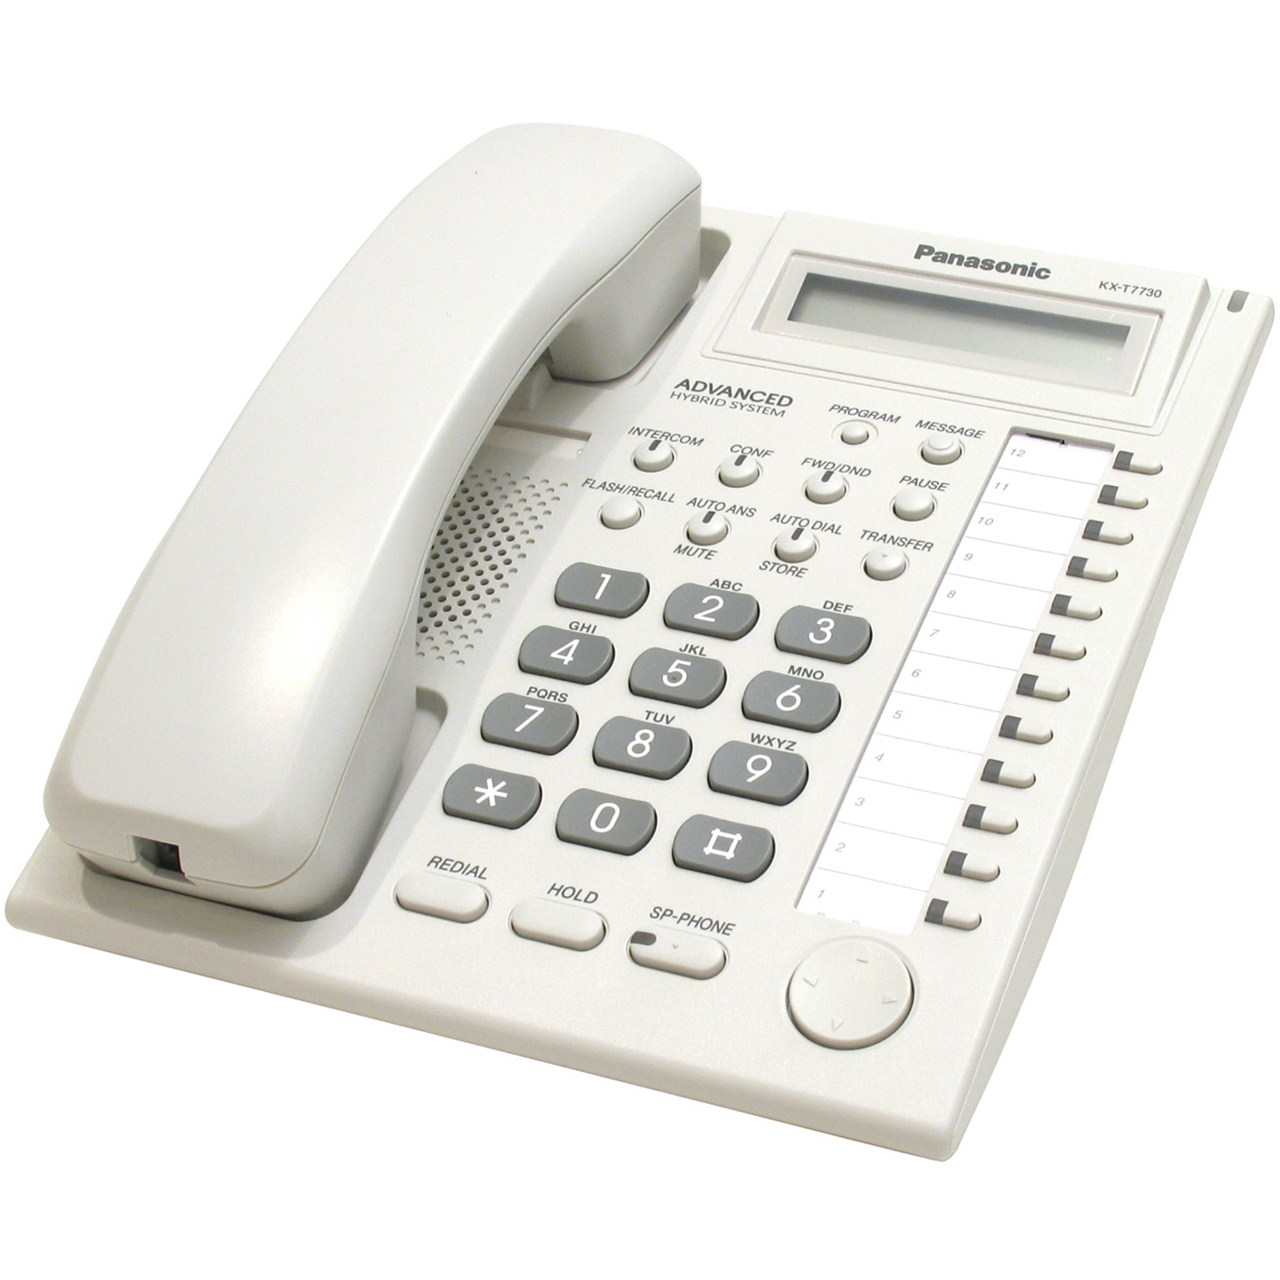 تصویر تلفن سانترال پاناسونیک مدل KX-T7730X